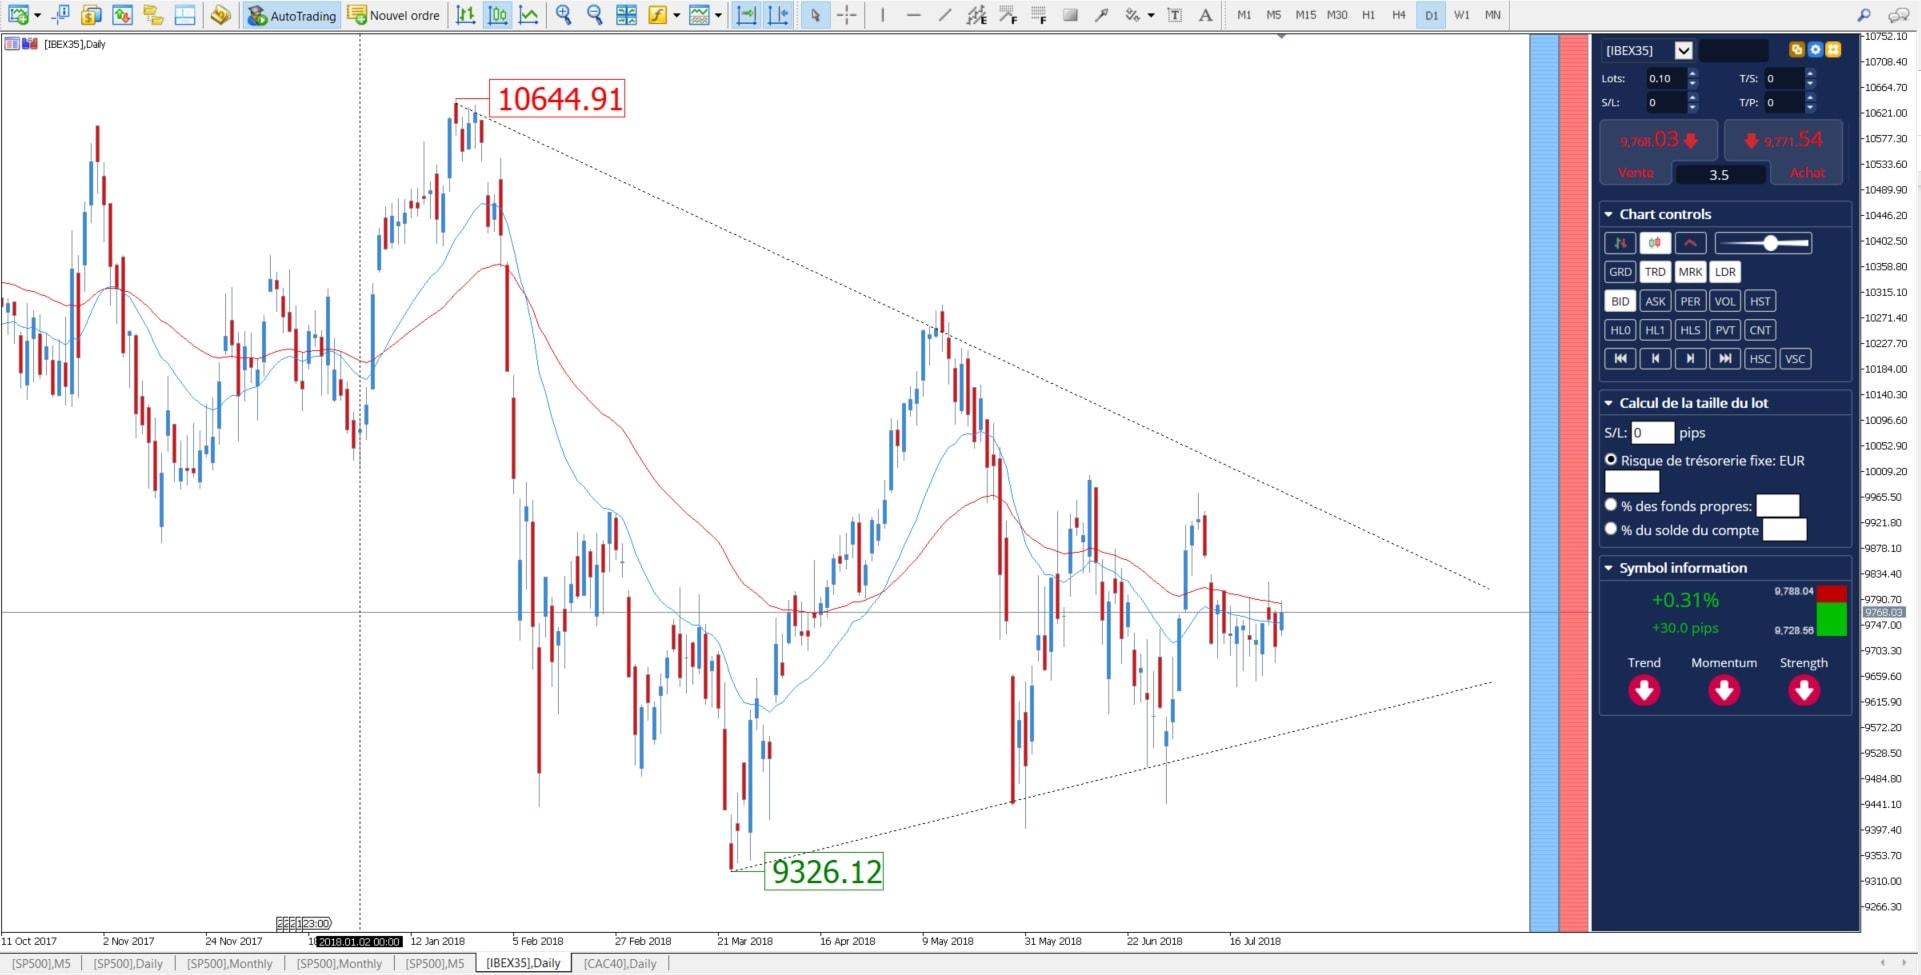 trading ibex 35